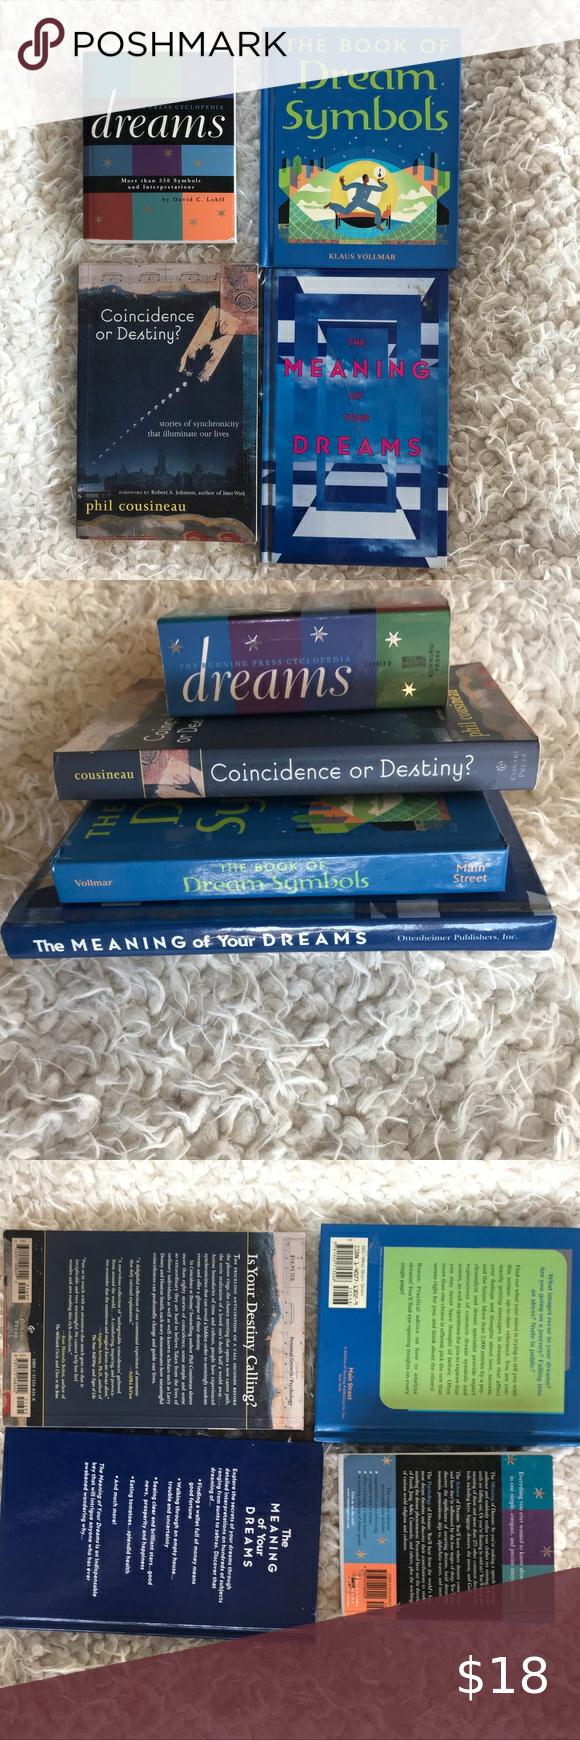 Lot Of 4 Books On Dreams Dream Symbols And Meaning In 2020 Dream Symbols Symbols Coincidences